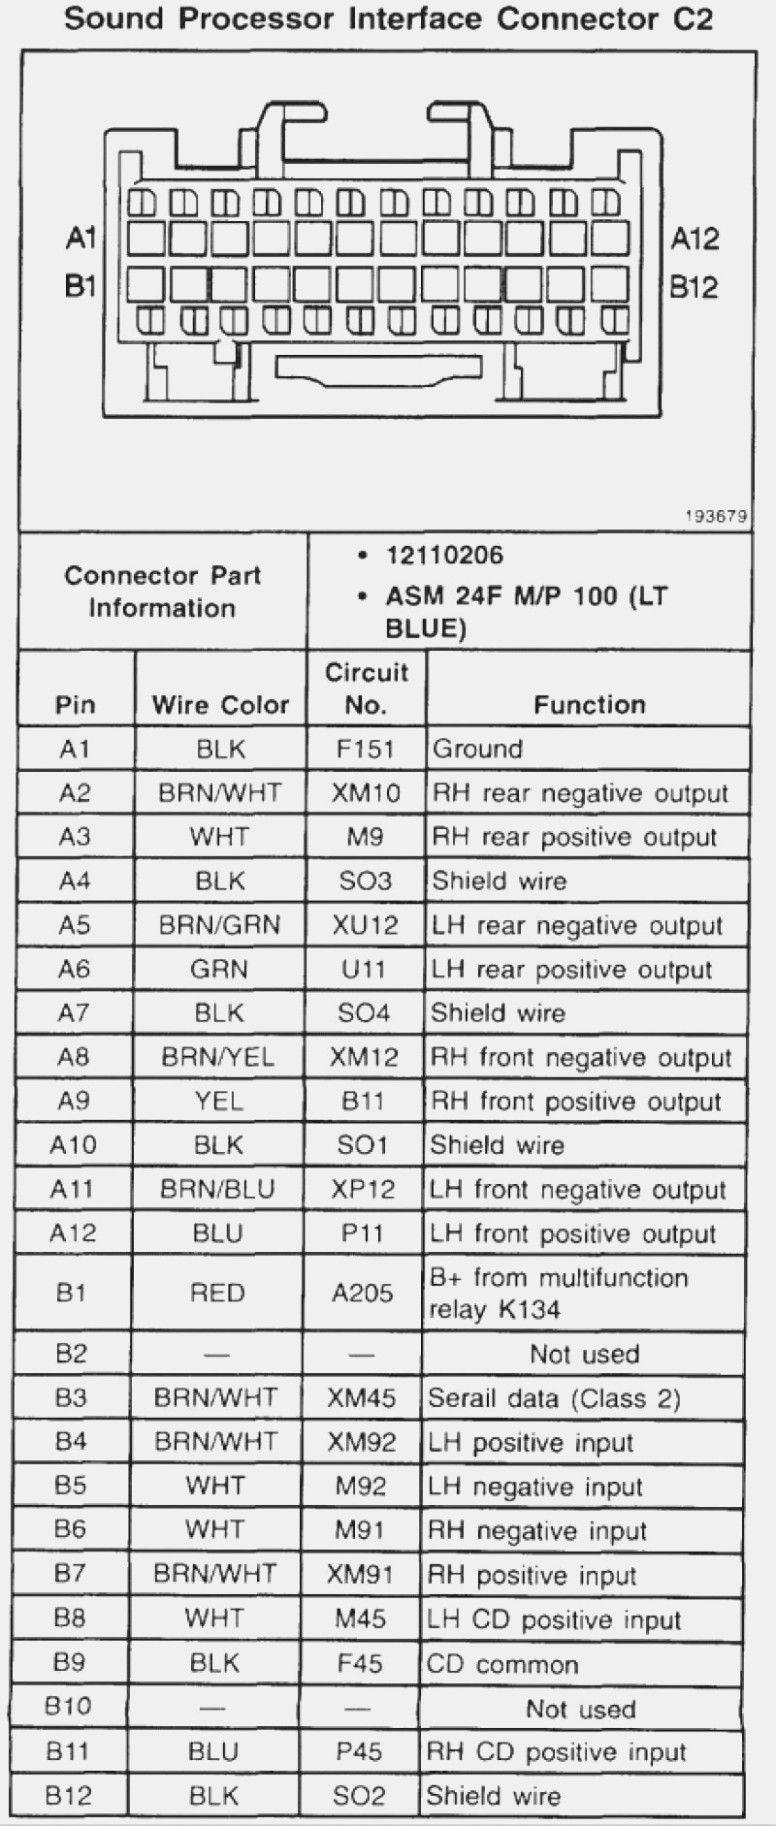 pioneer deh 3900mp wiring diagram pioneer deh wiring diagram for 1997 ram 1500 free gone main imgdb co  pioneer deh wiring diagram for 1997 ram